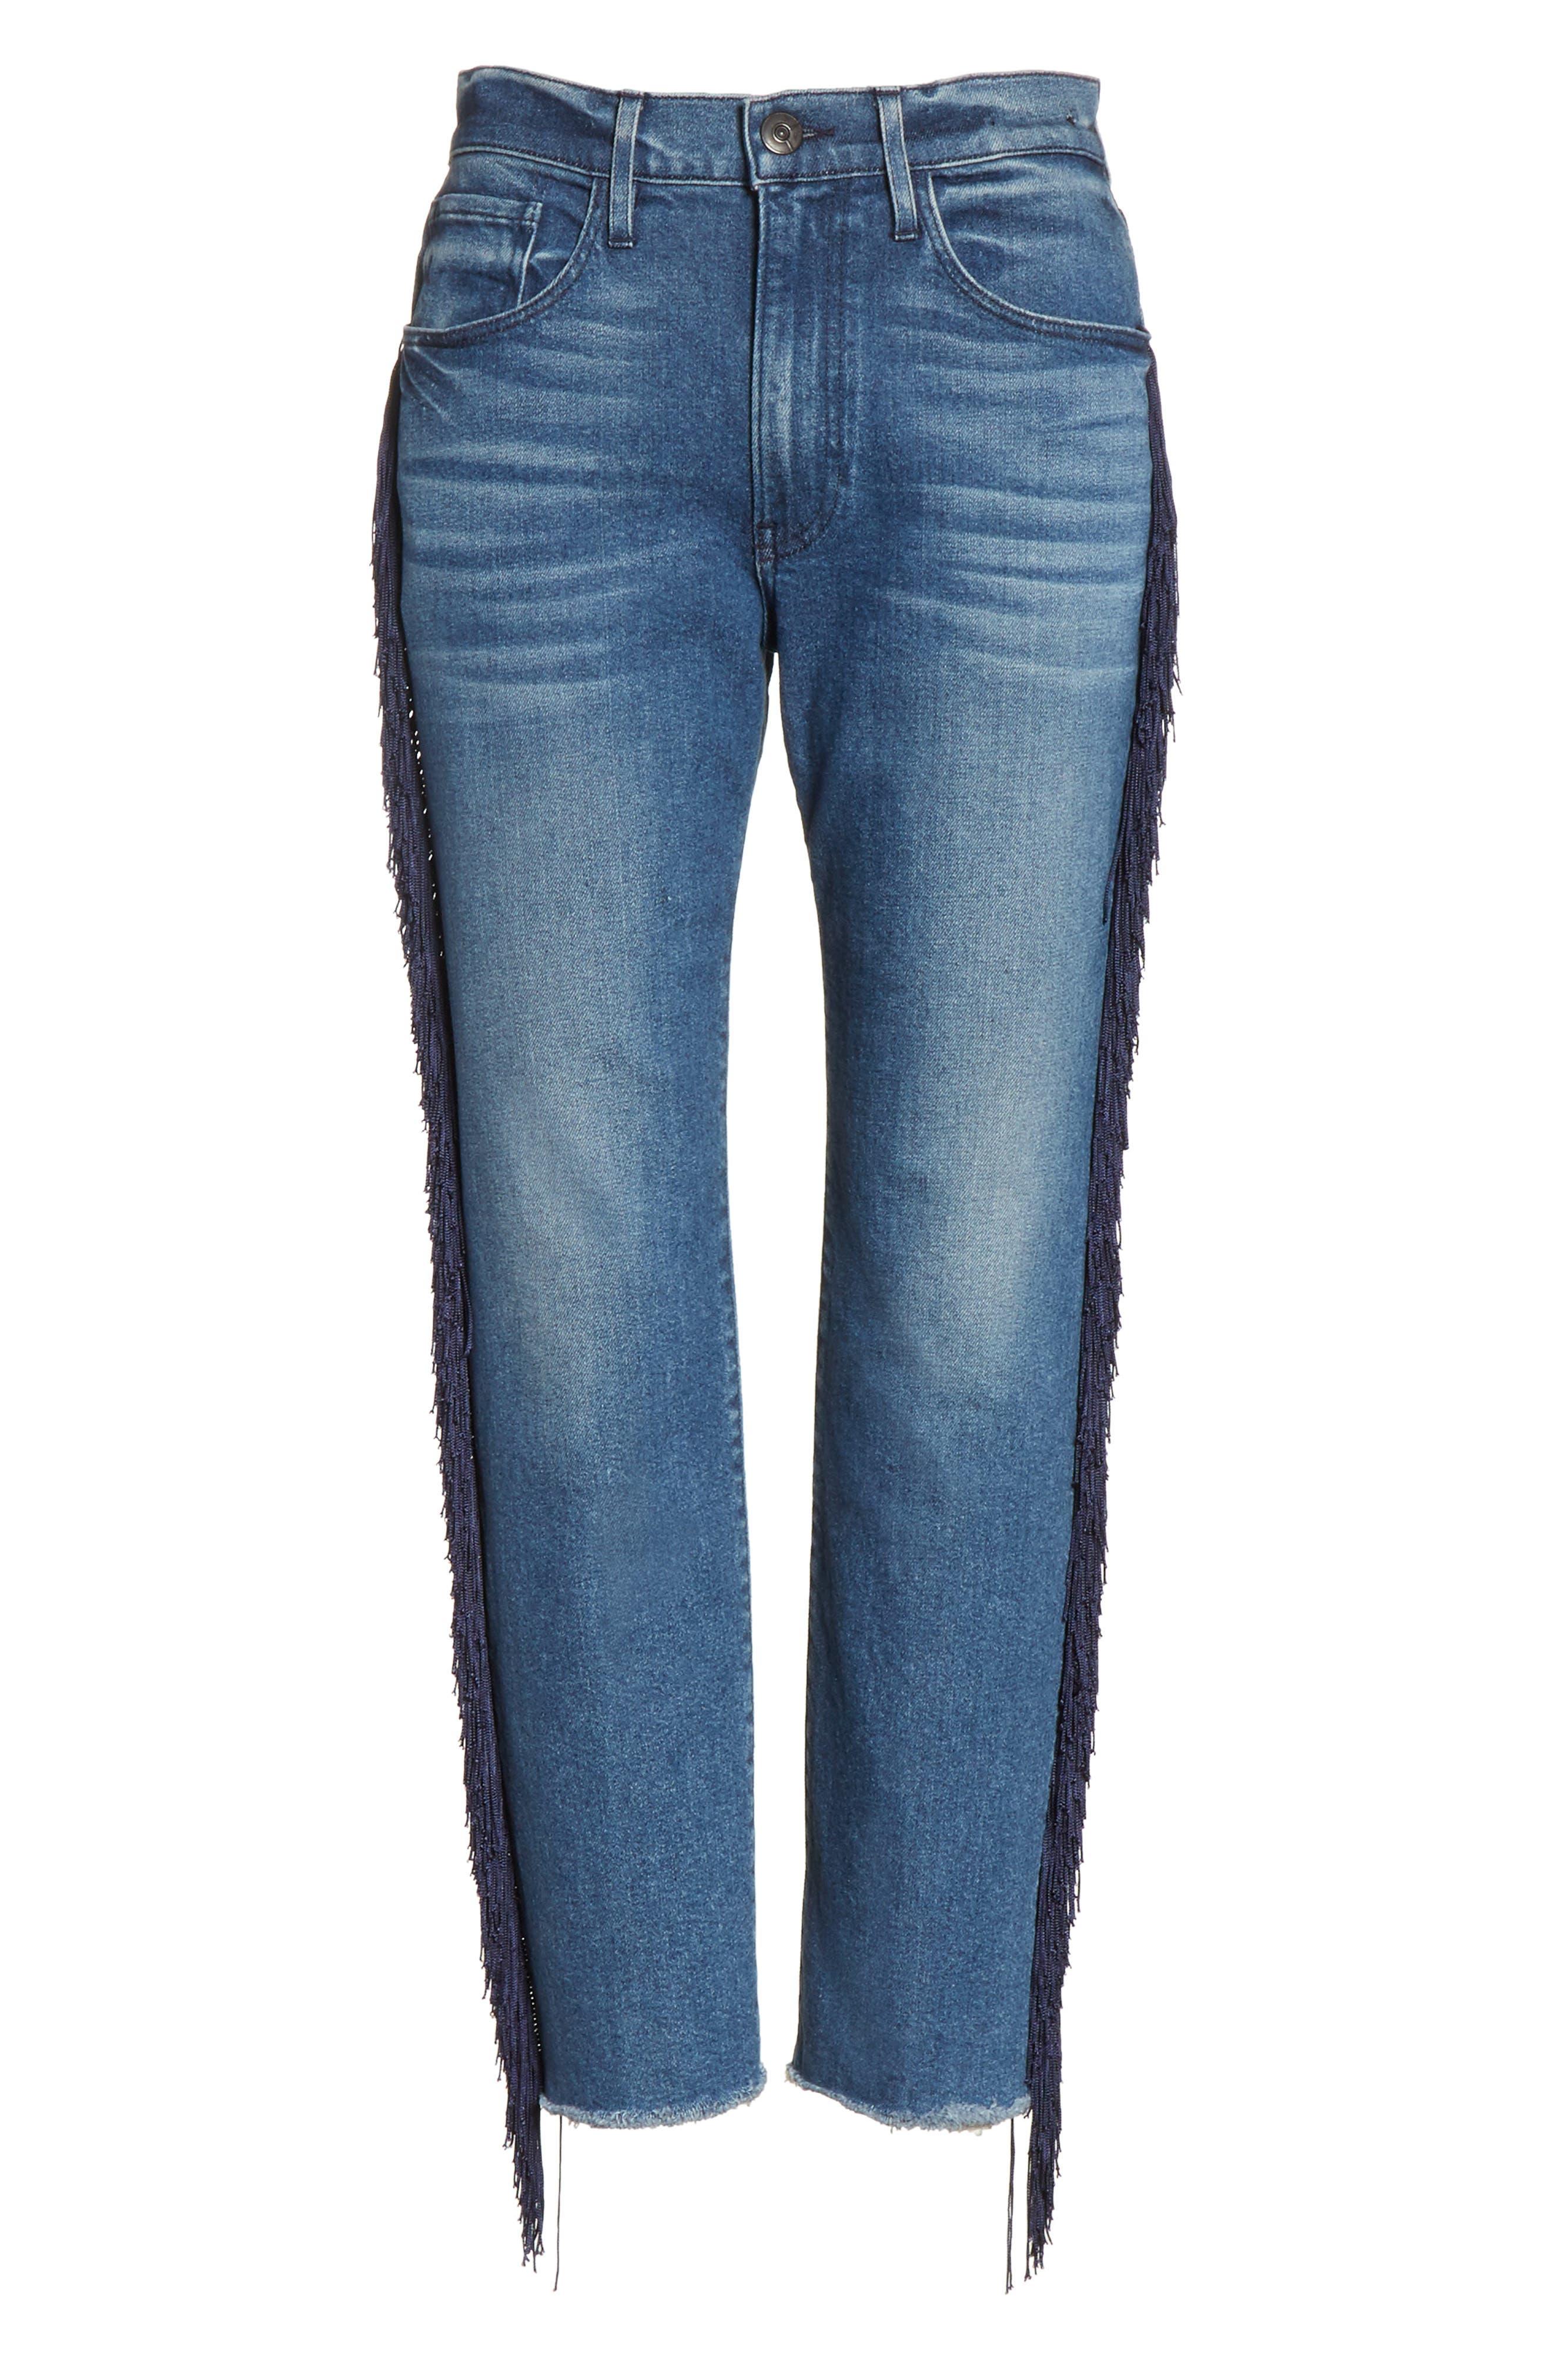 W3 Higher Ground Fringe Crop Straight Leg Jeans,                             Alternate thumbnail 6, color,                             426